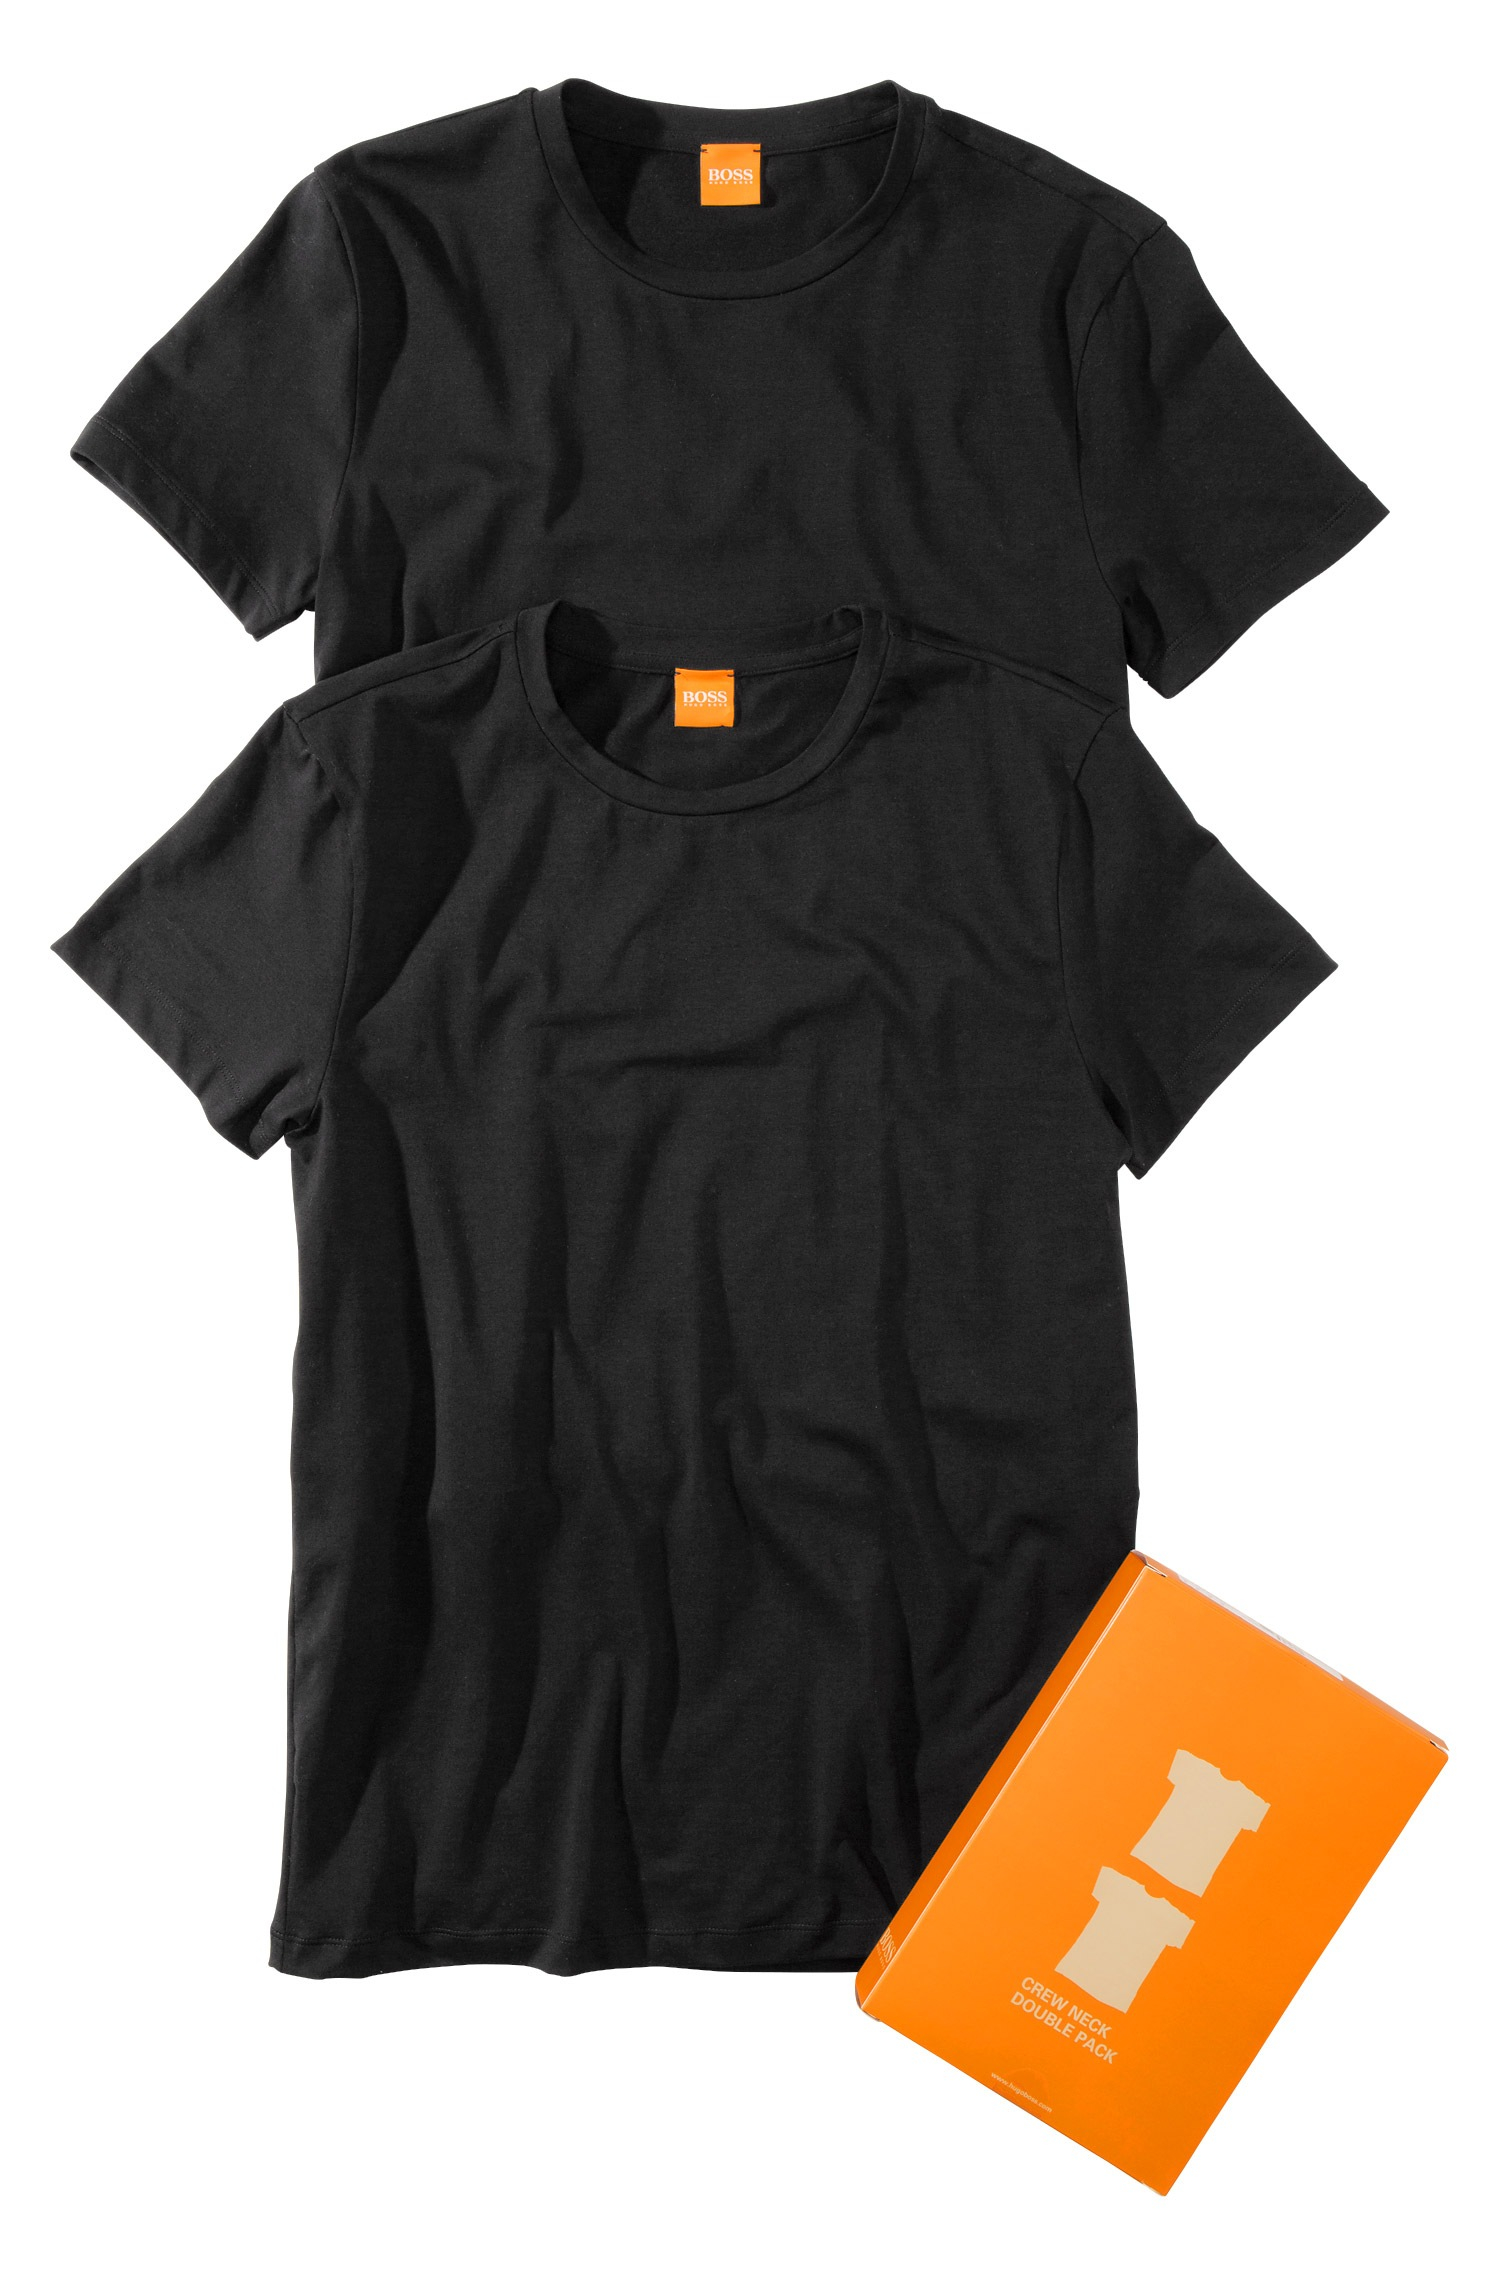 lyst boss orange t shirt 39 tedd 39 in a pack of 2 in black. Black Bedroom Furniture Sets. Home Design Ideas